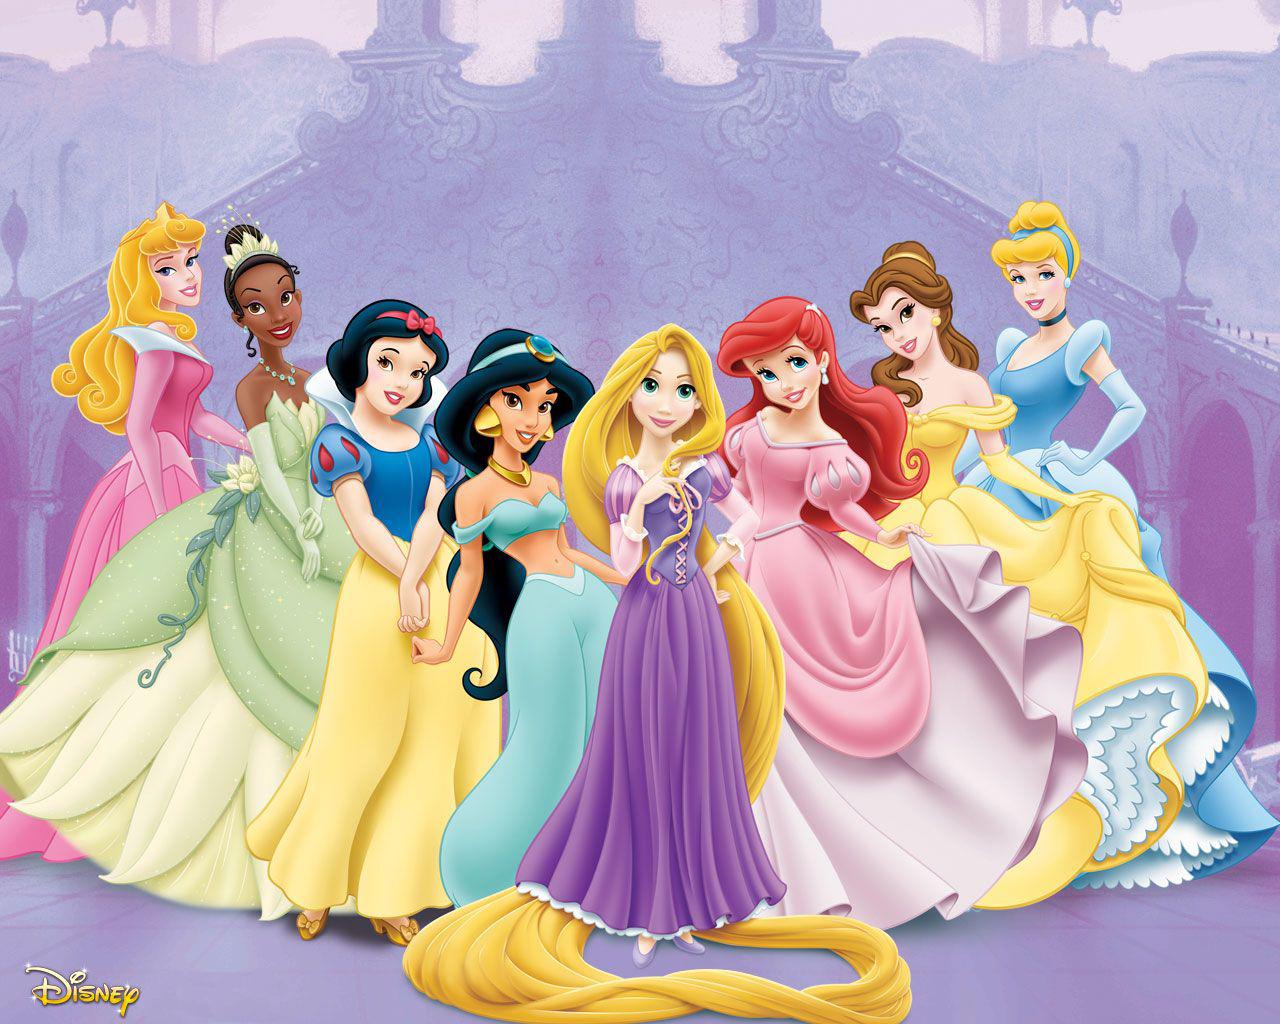 Princesas disney fondos disney princess wallpapers - Image de princesse disney ...